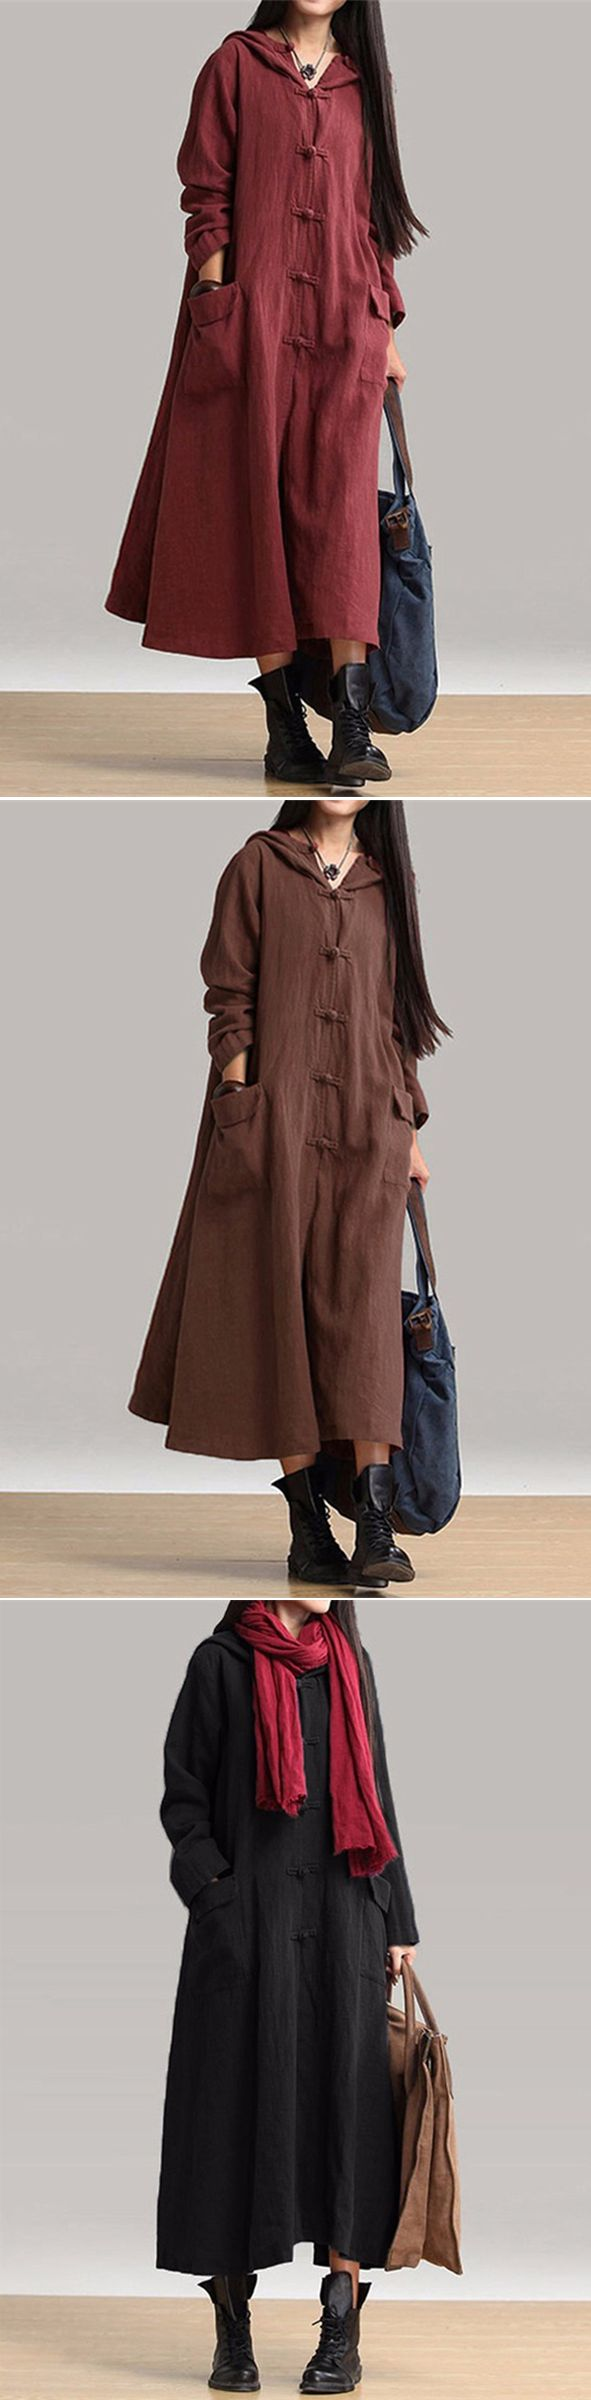 Us gracila women vintage plate buckles long sleeve hooded